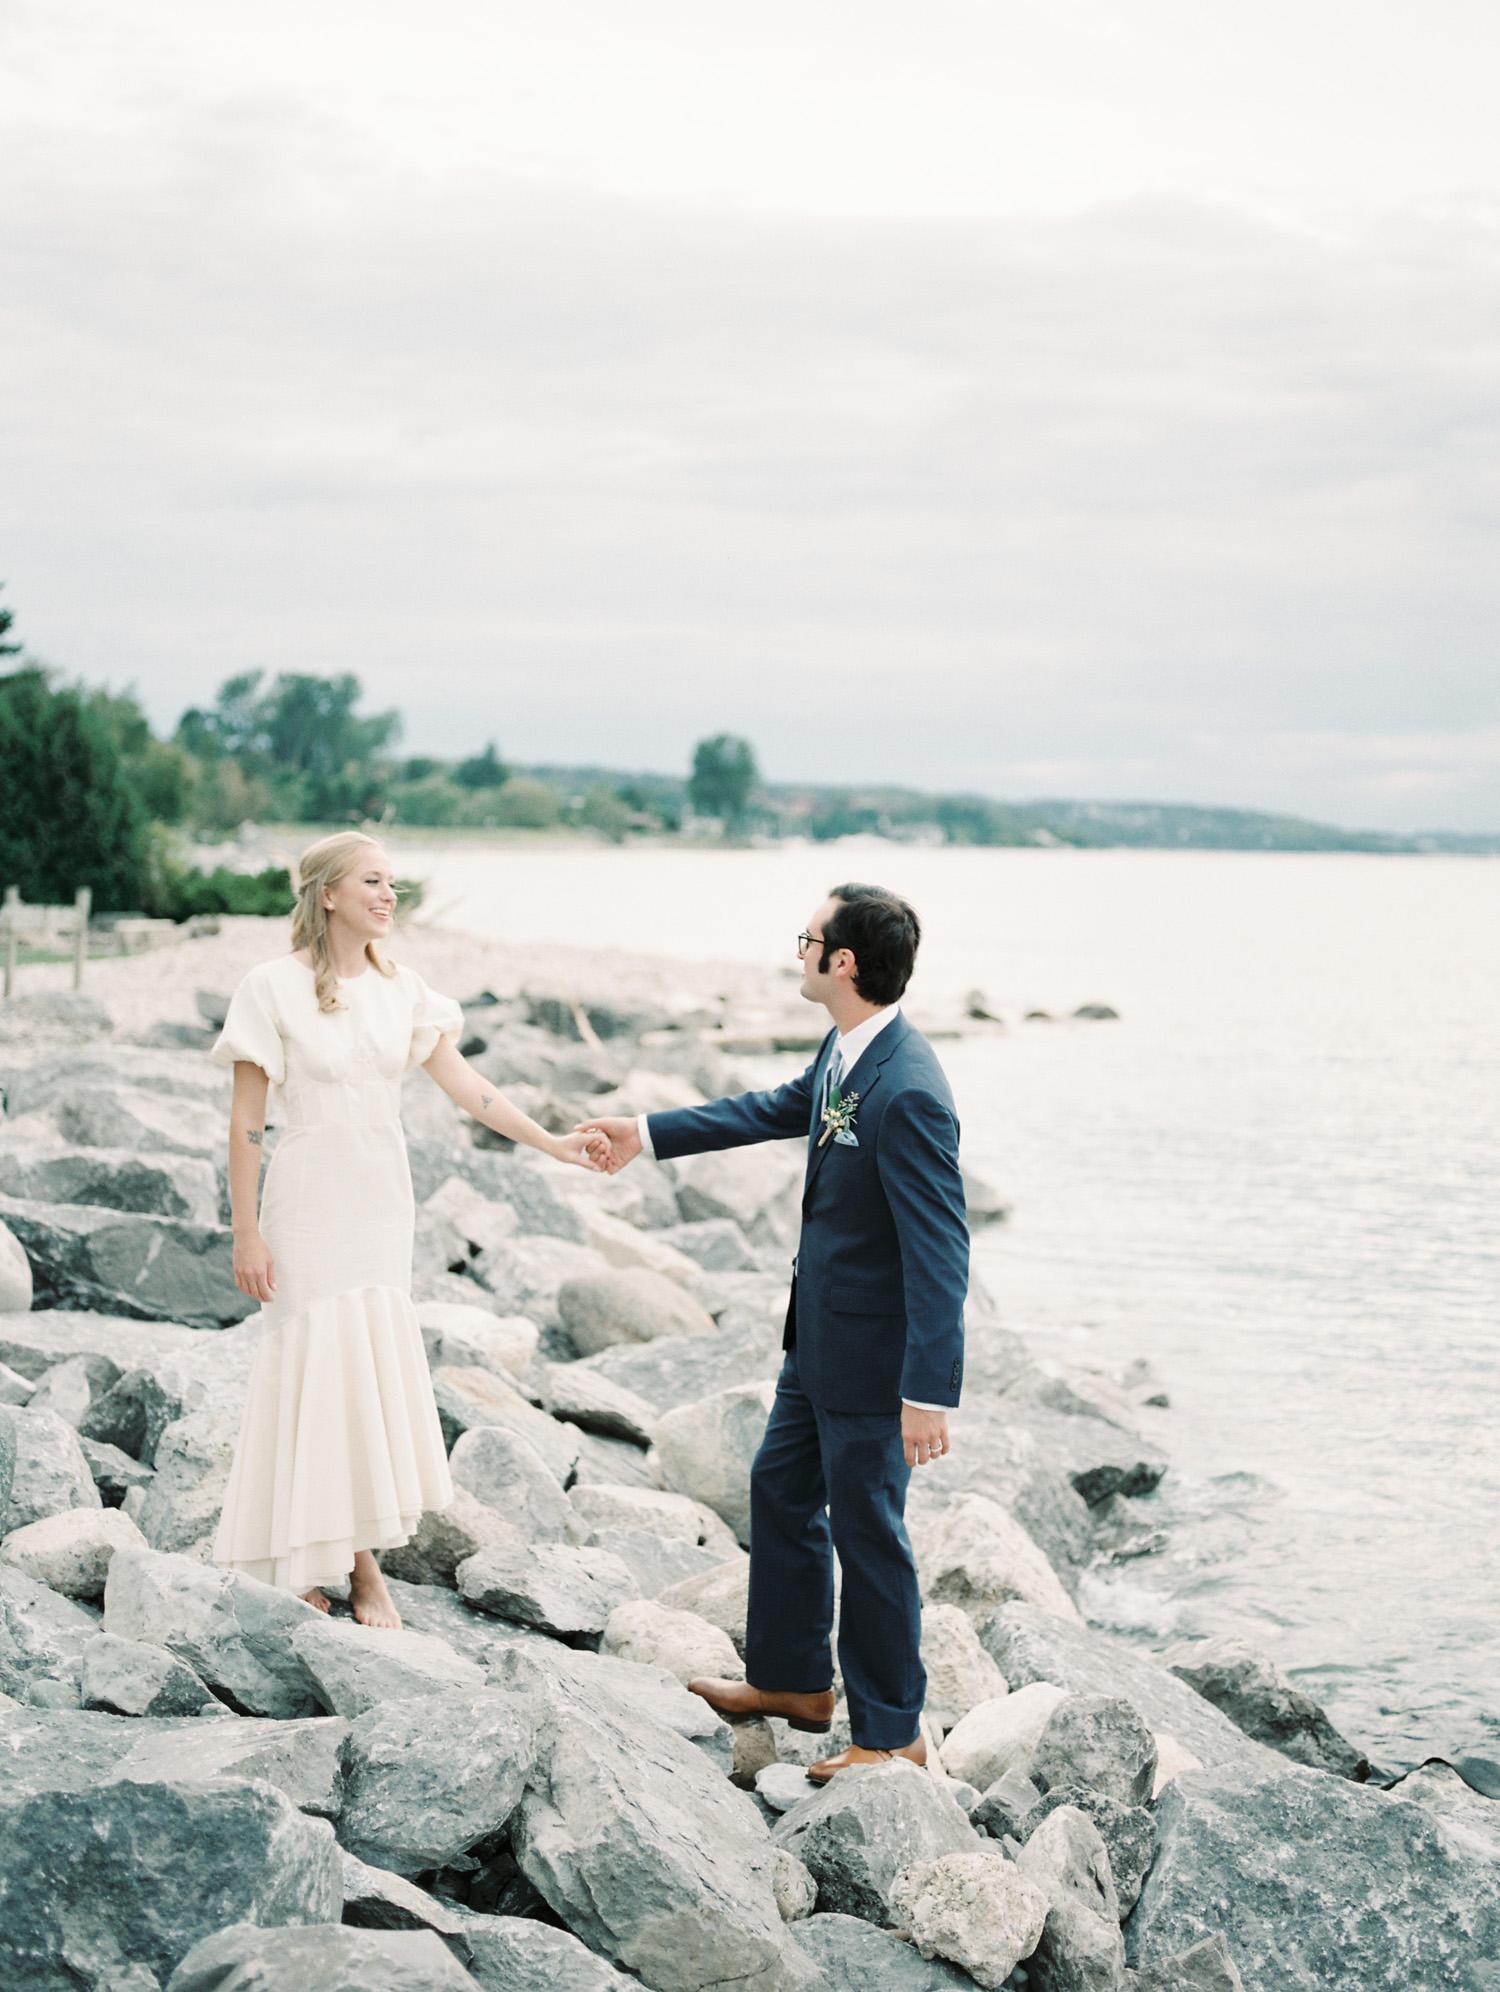 A wedding couple walks along rocks on Lake Michigan in Petoskey